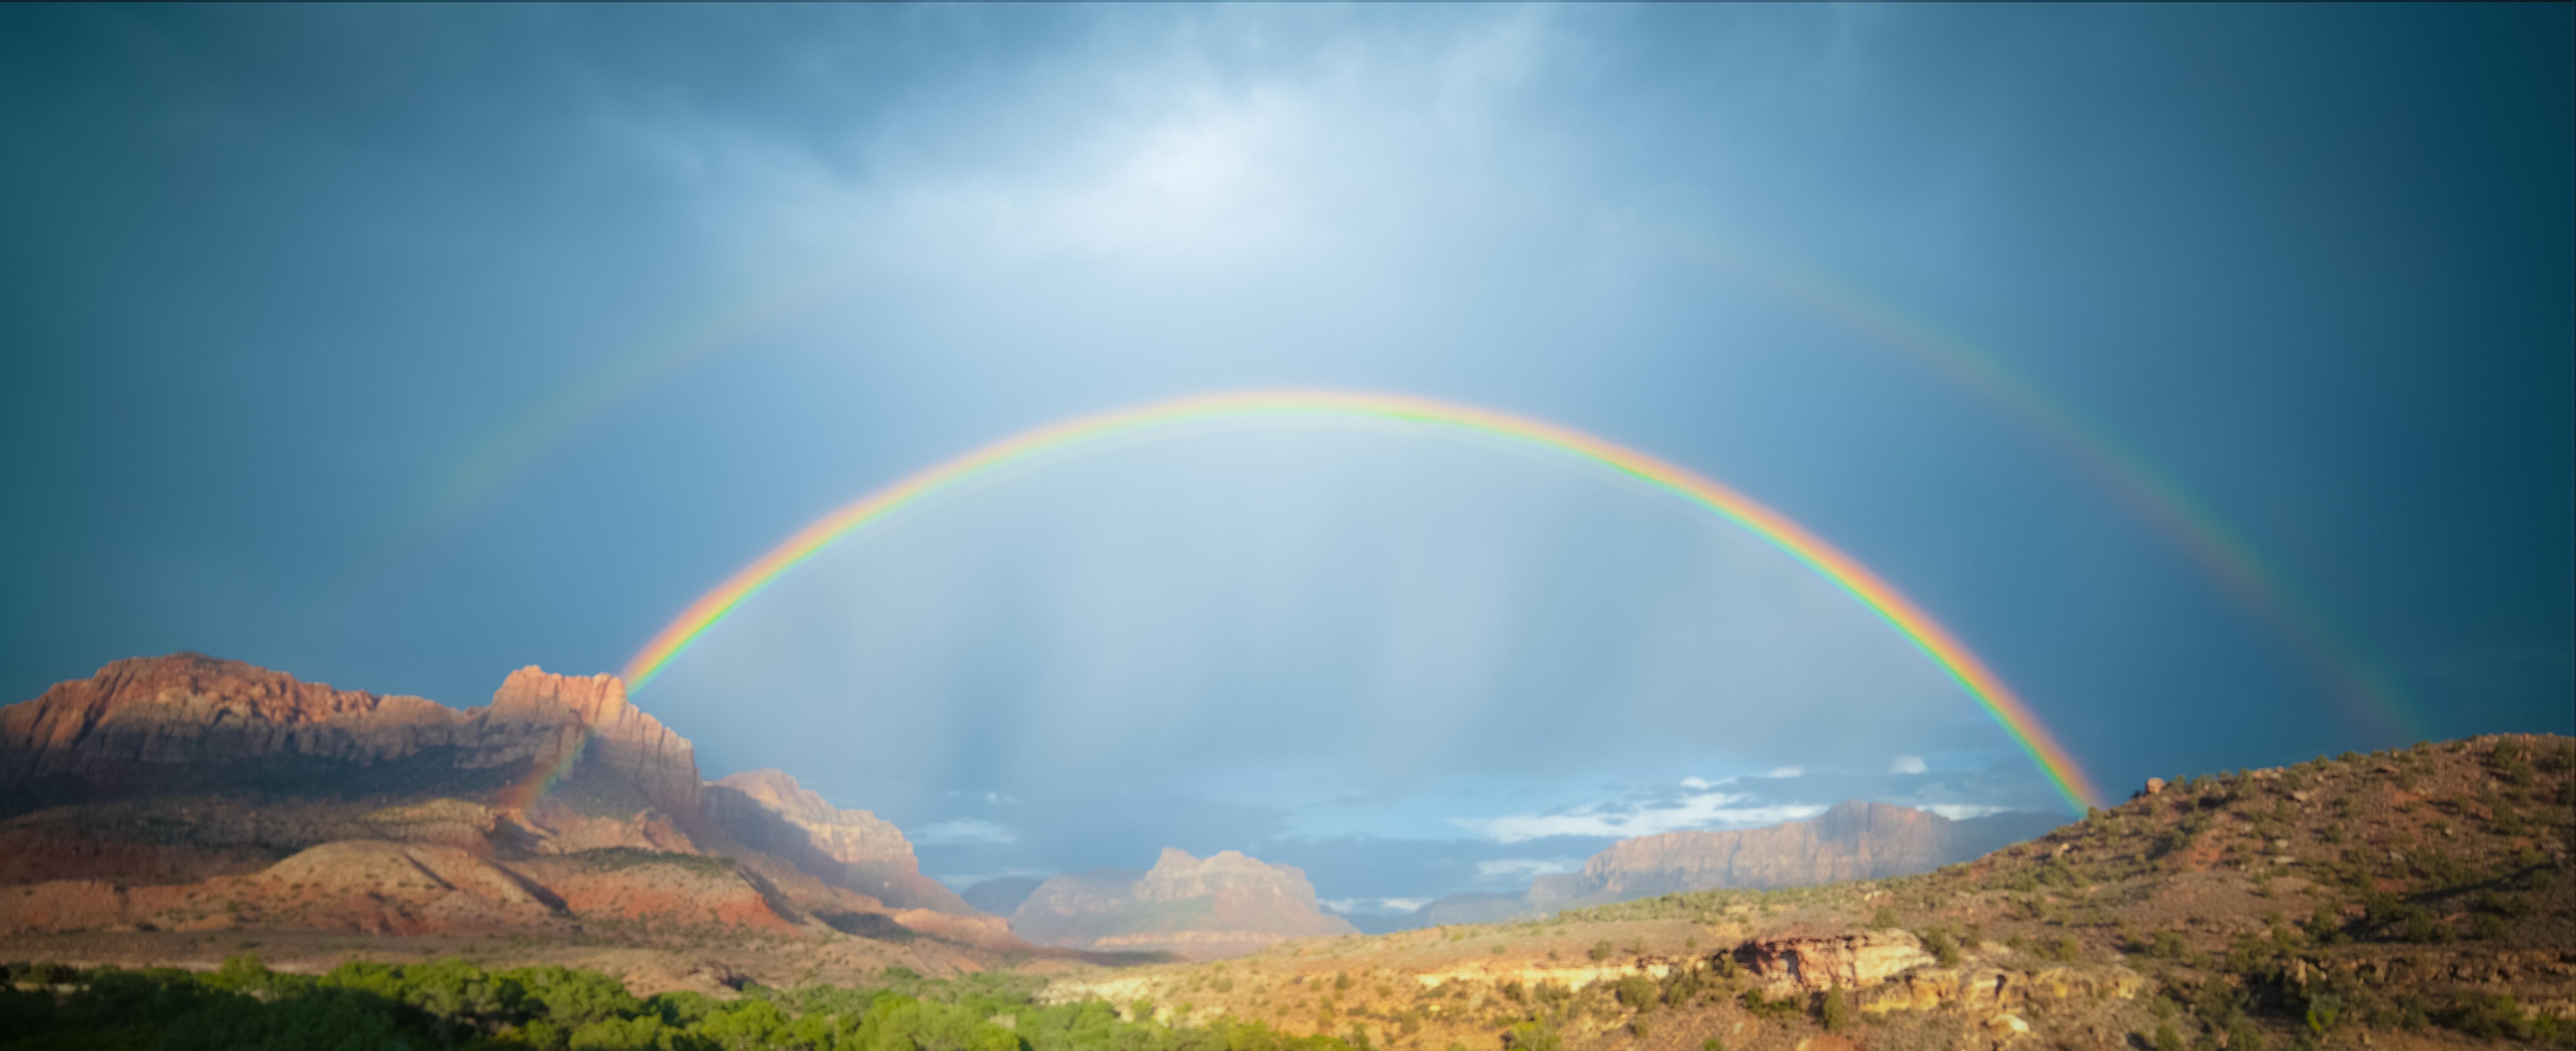 Utah - Rainbow - Nilas Photography-1